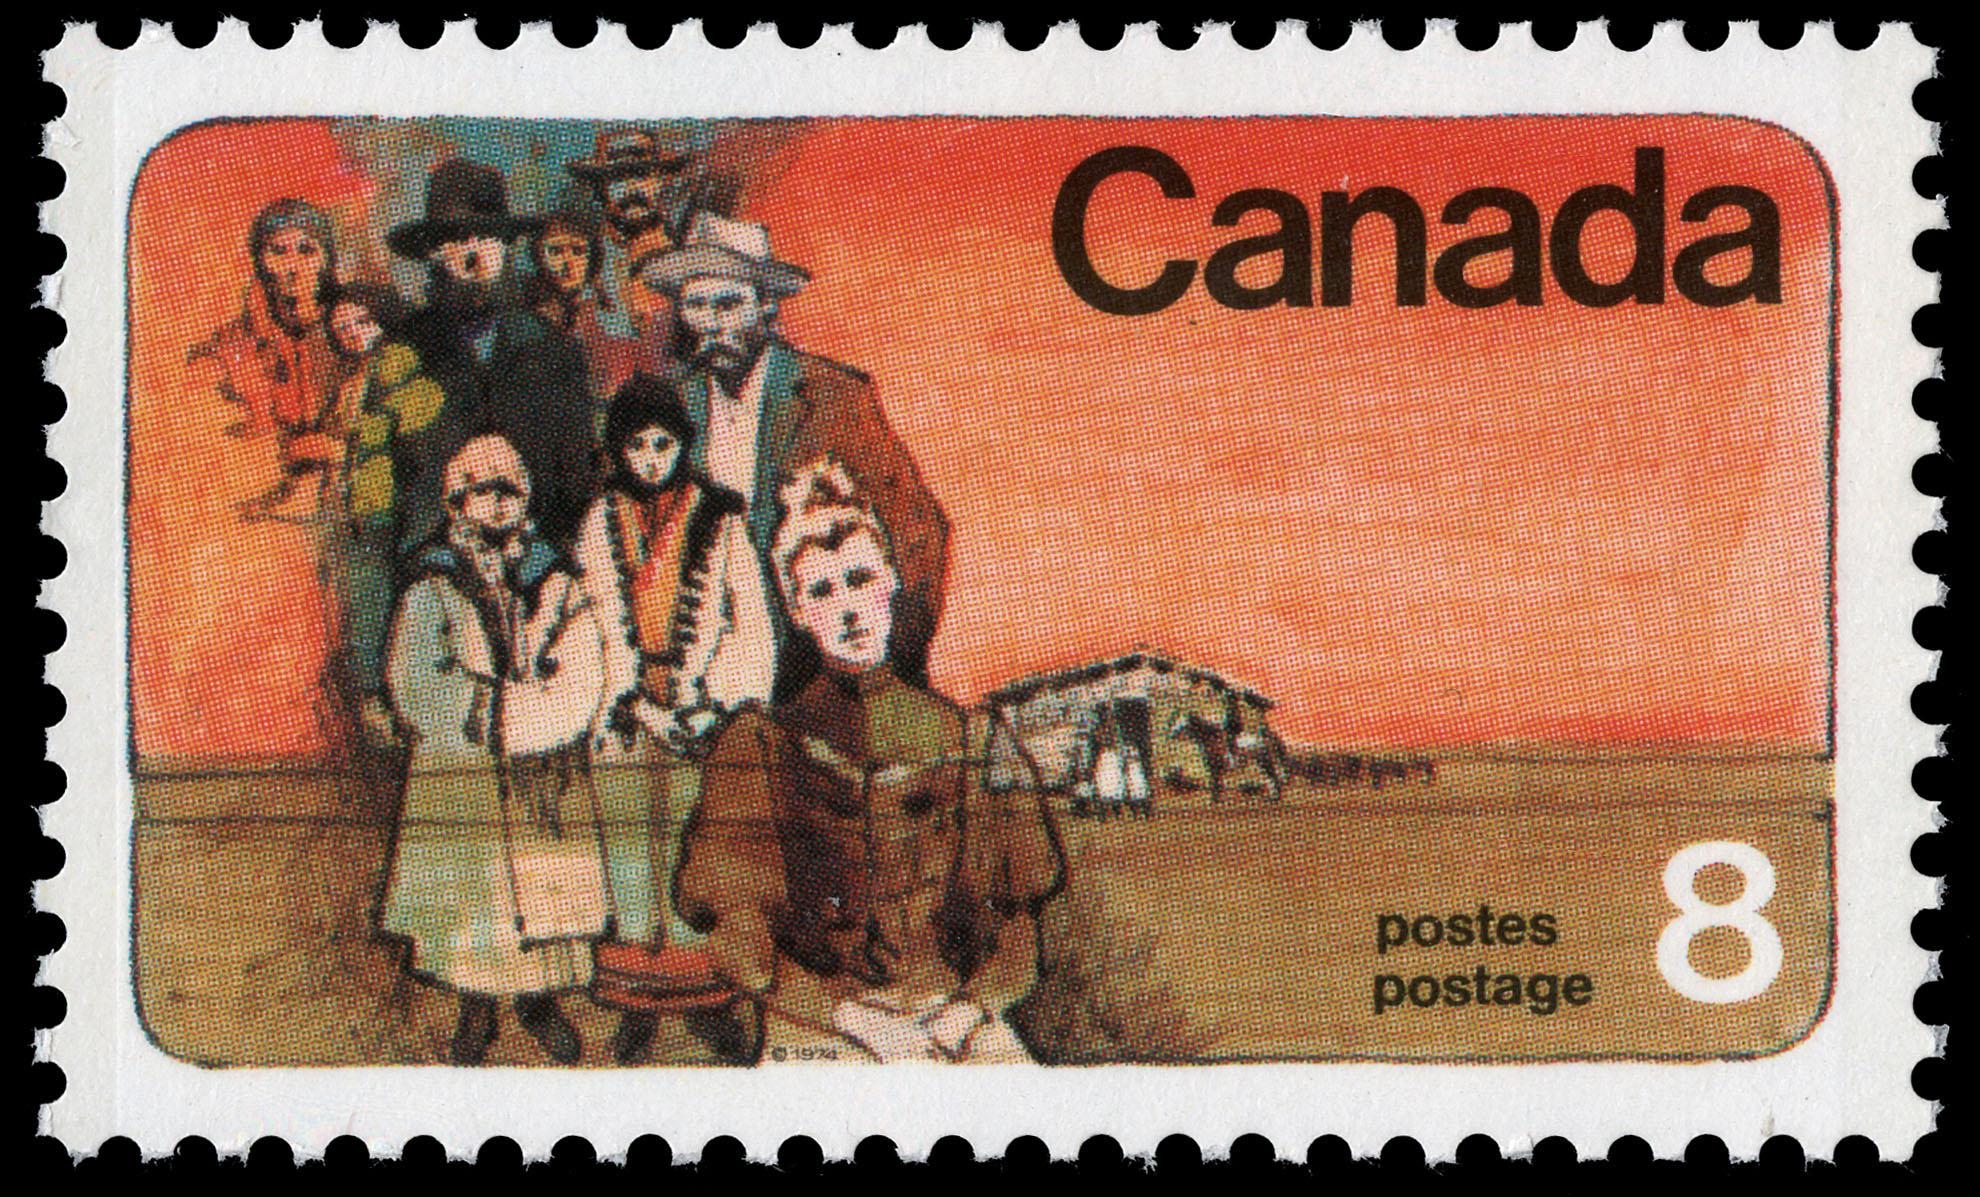 Prairie Settlers Canada Postage Stamp